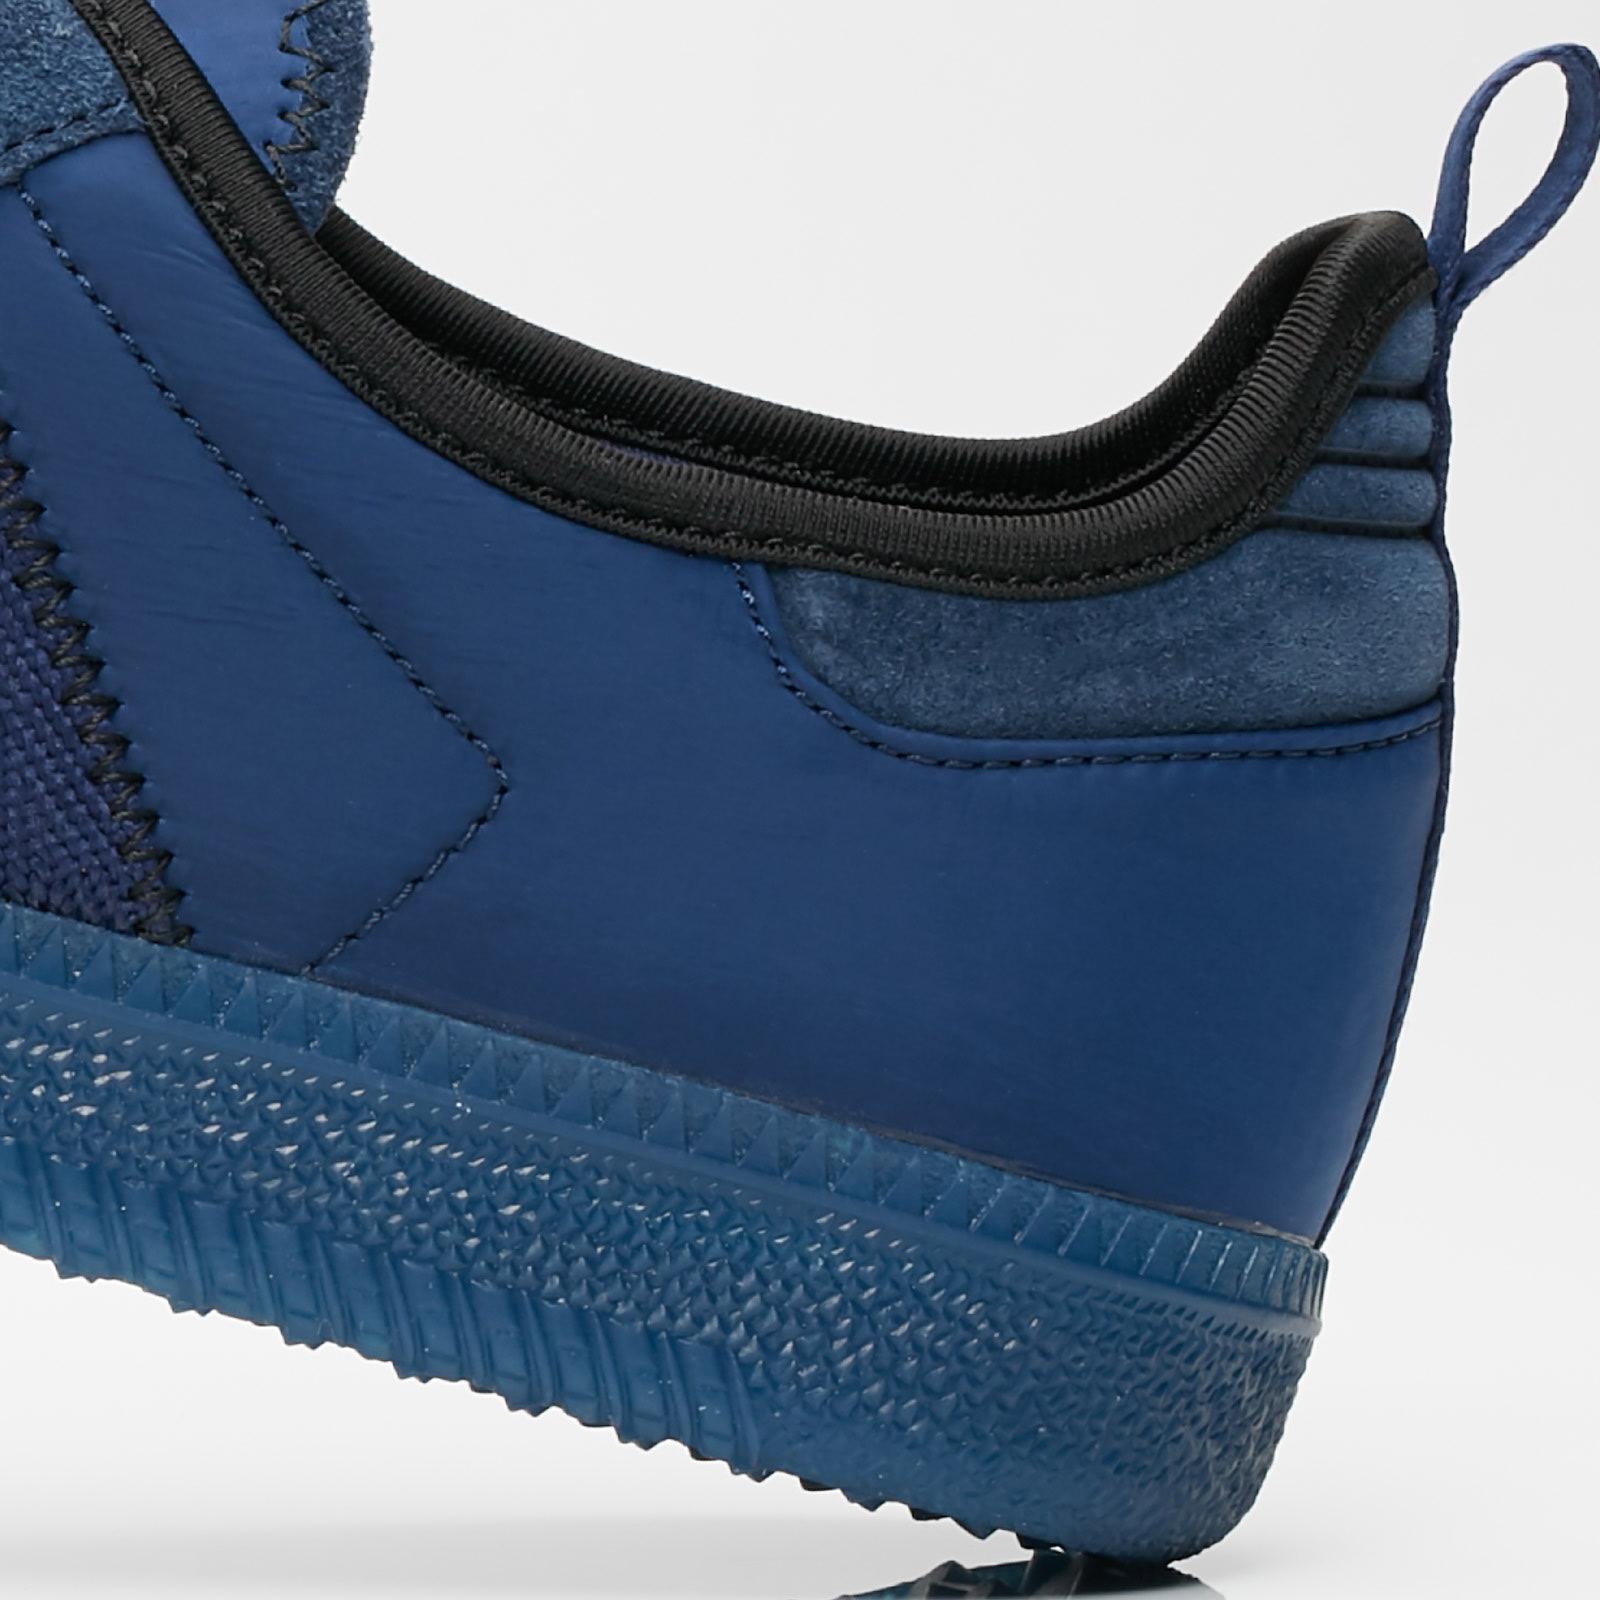 best service 4efd7 6e44d adidas Samba x C.P. Company - Cg5957 - Sneakersnstuff ...